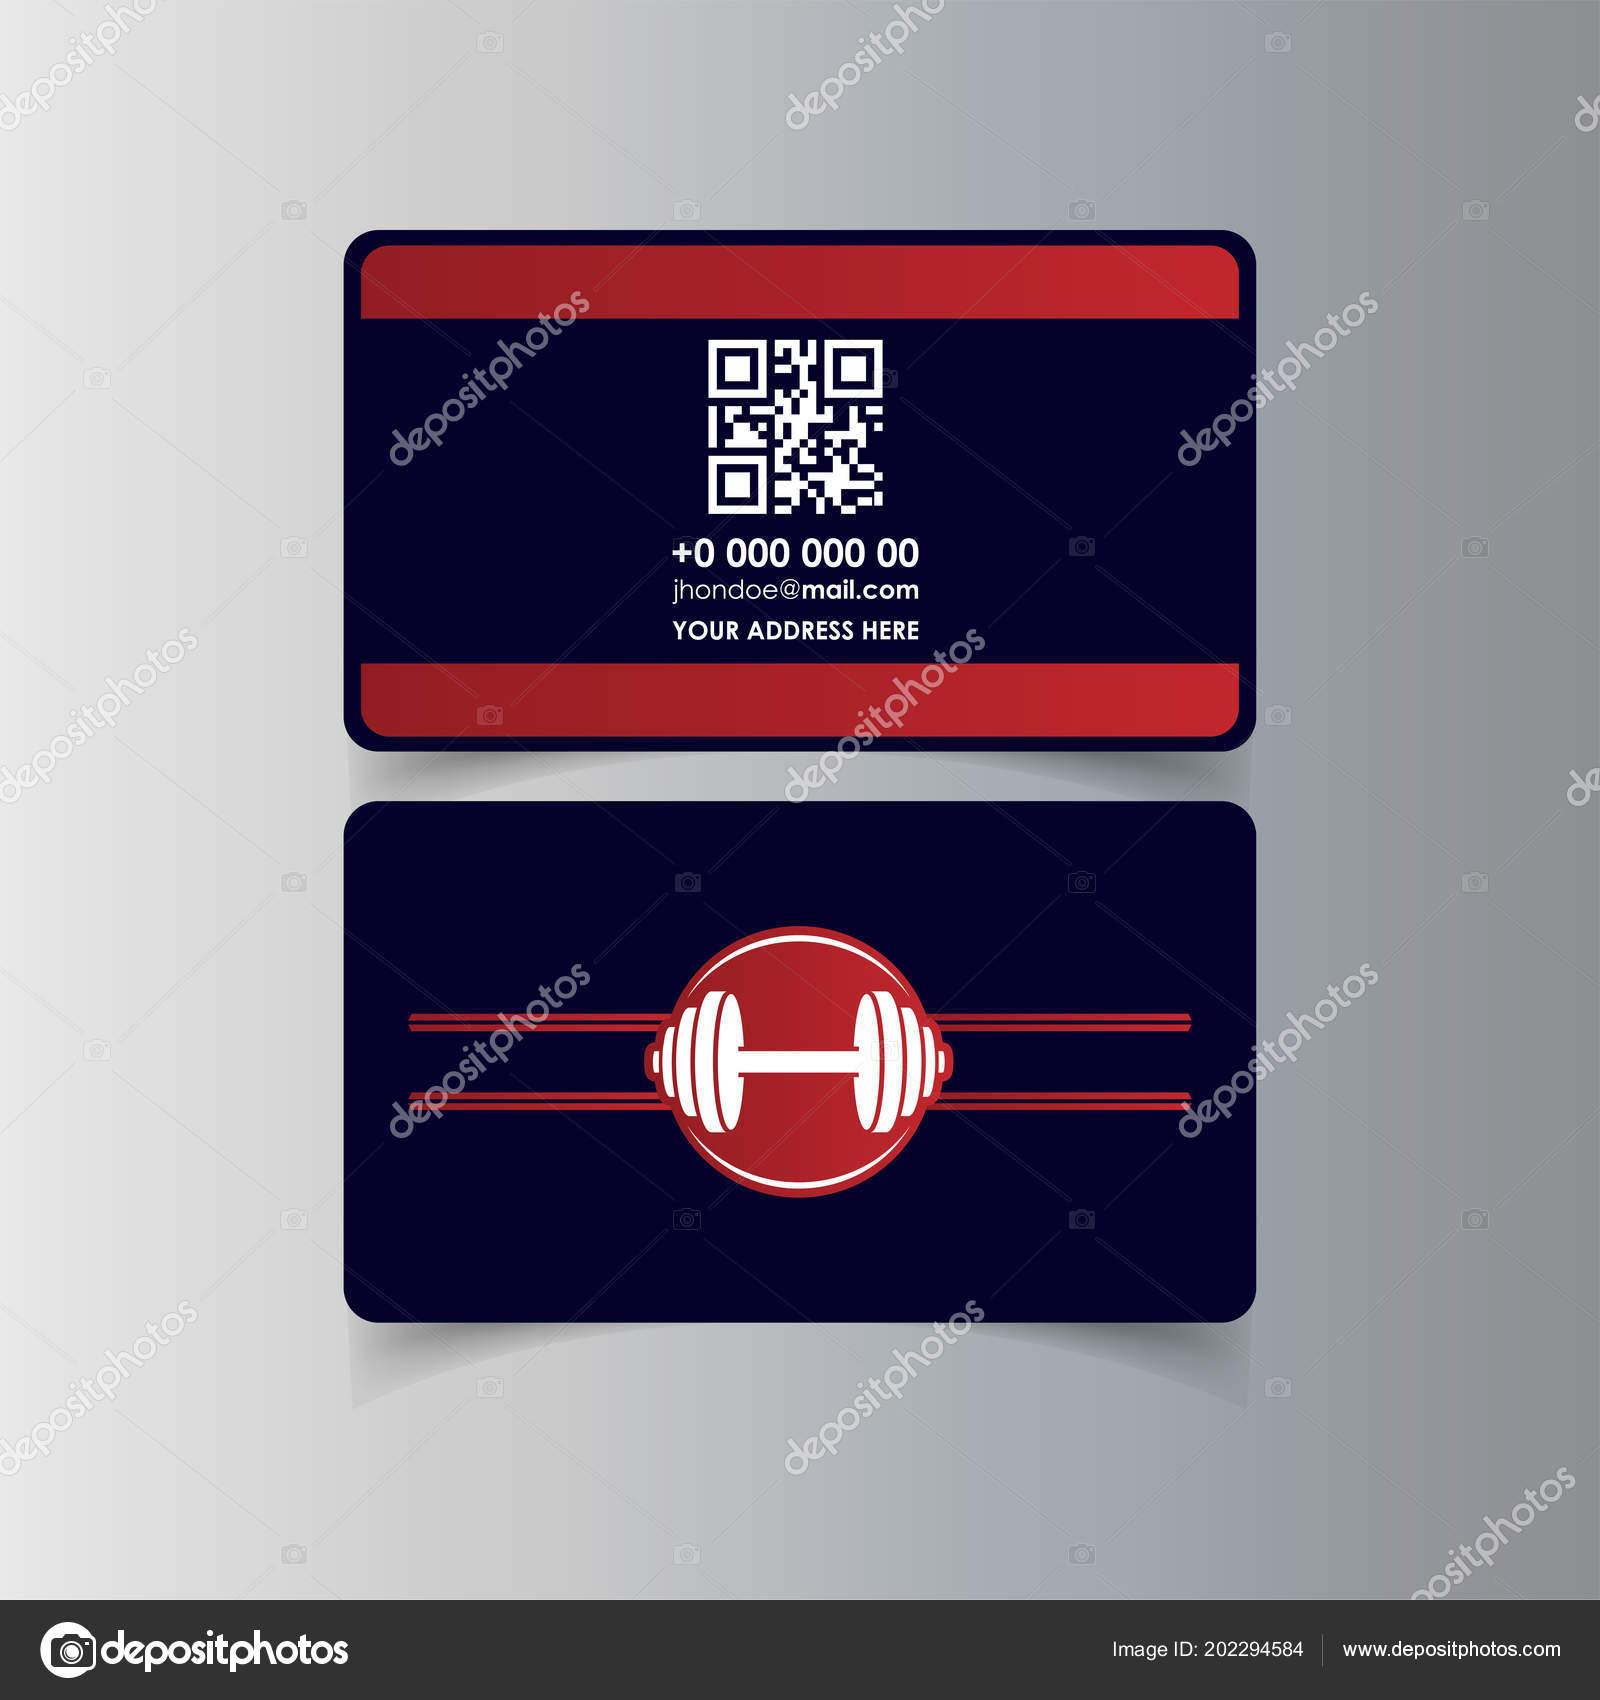 Business cards design gym logo vector illustration stock vector business cards design gym logo vector illustration stock vector colourmoves